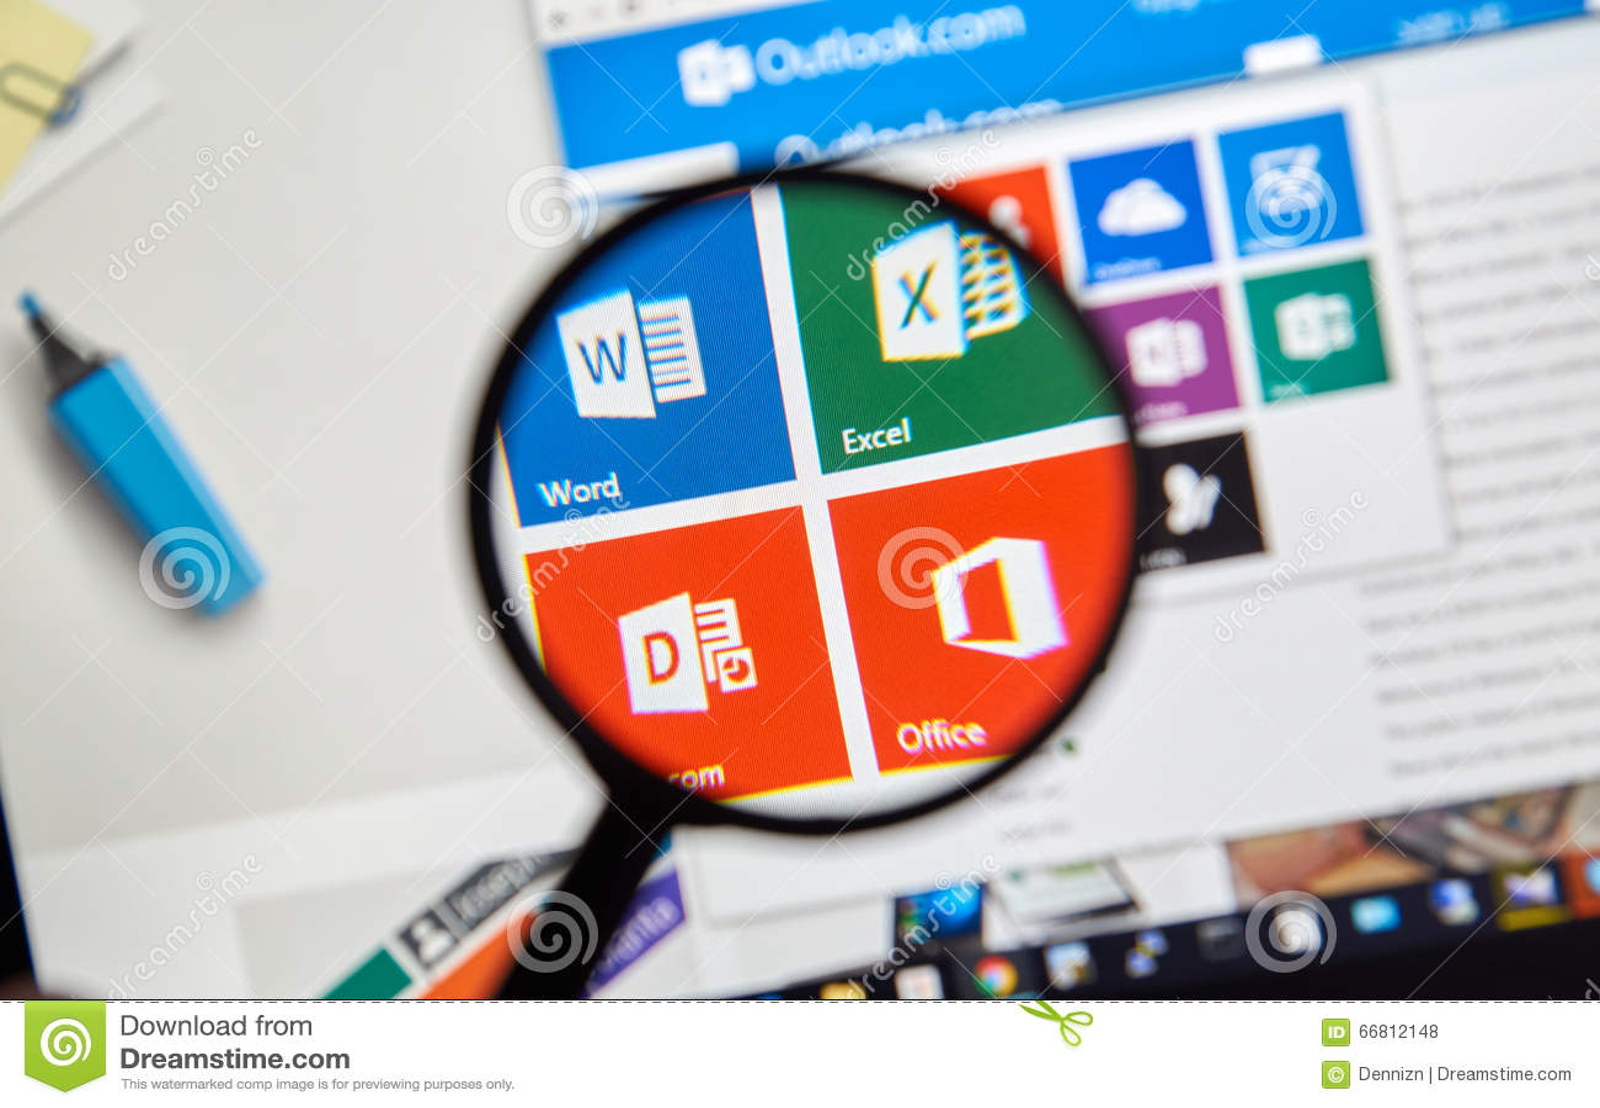 Microsoft Office słowo, Excel